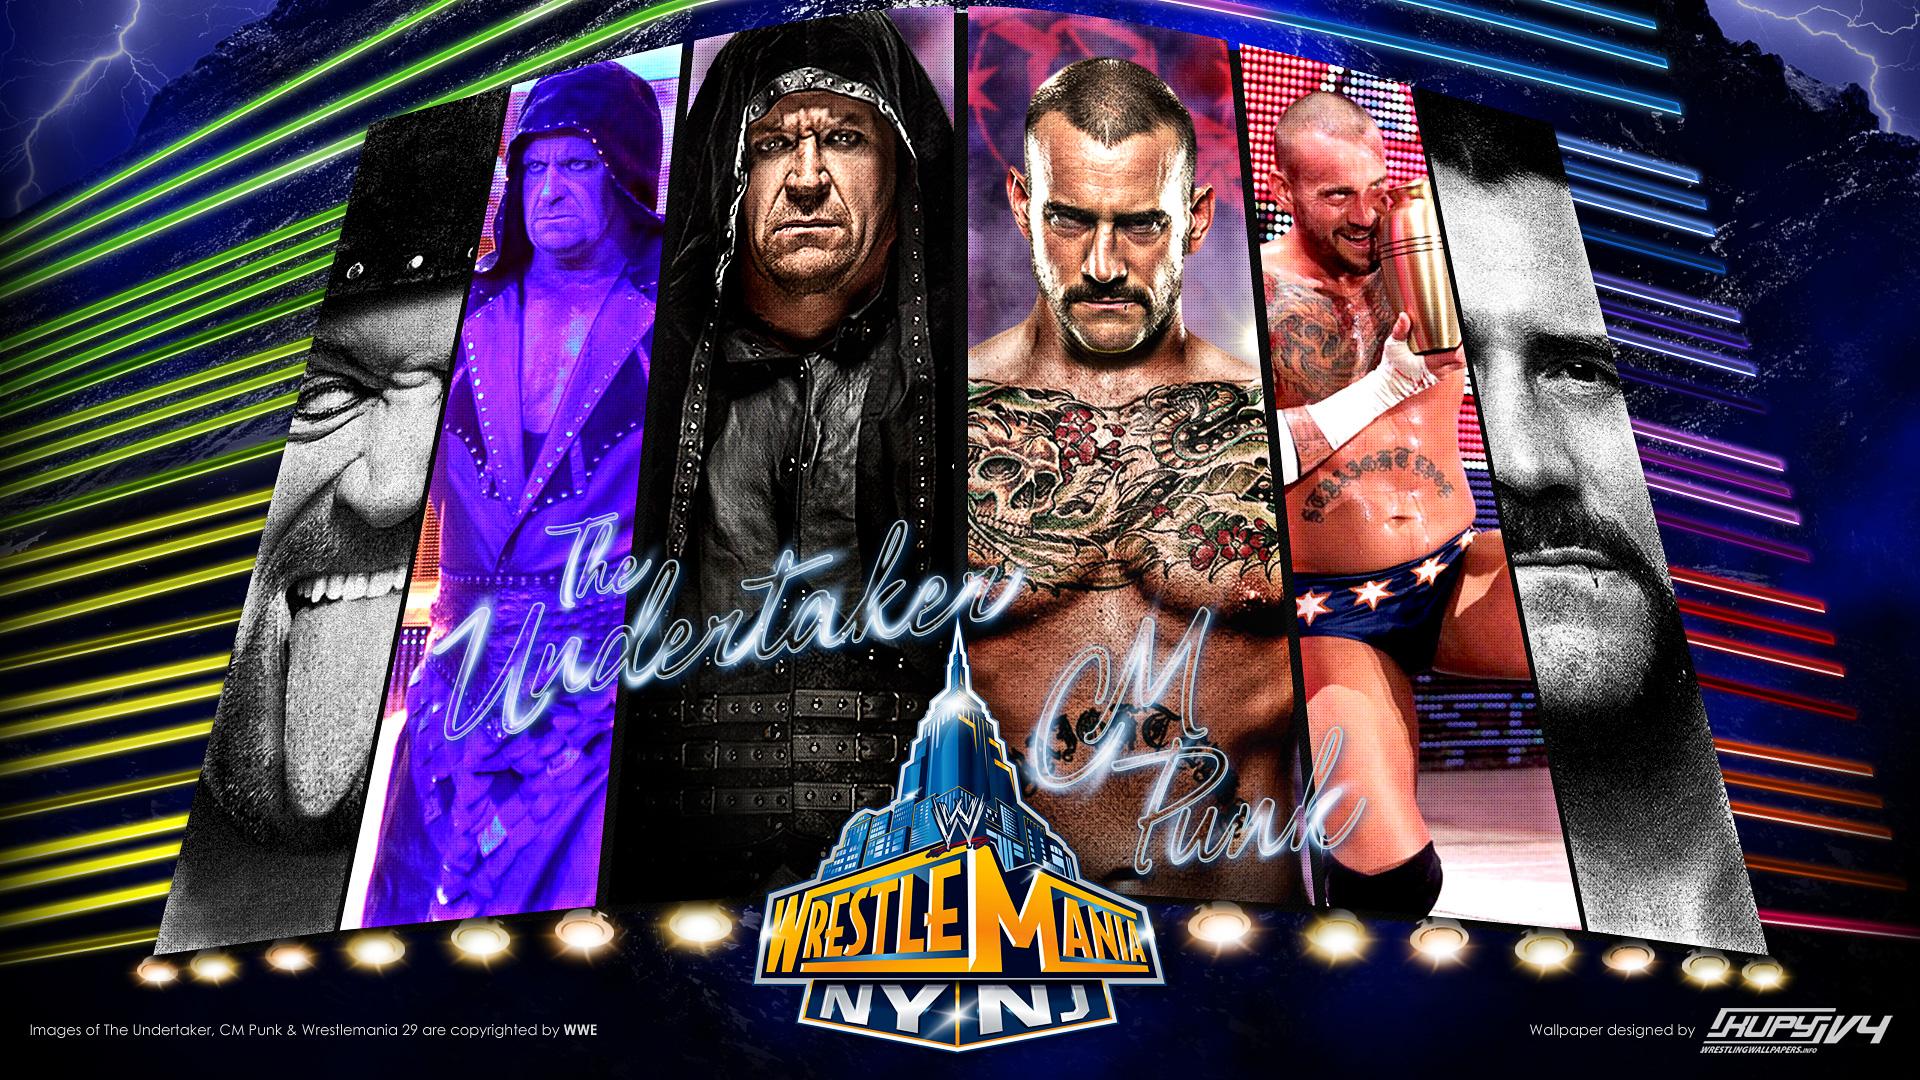 Wwe The Undertaker 1990s Wrestlemania-29-cm-punk- ...